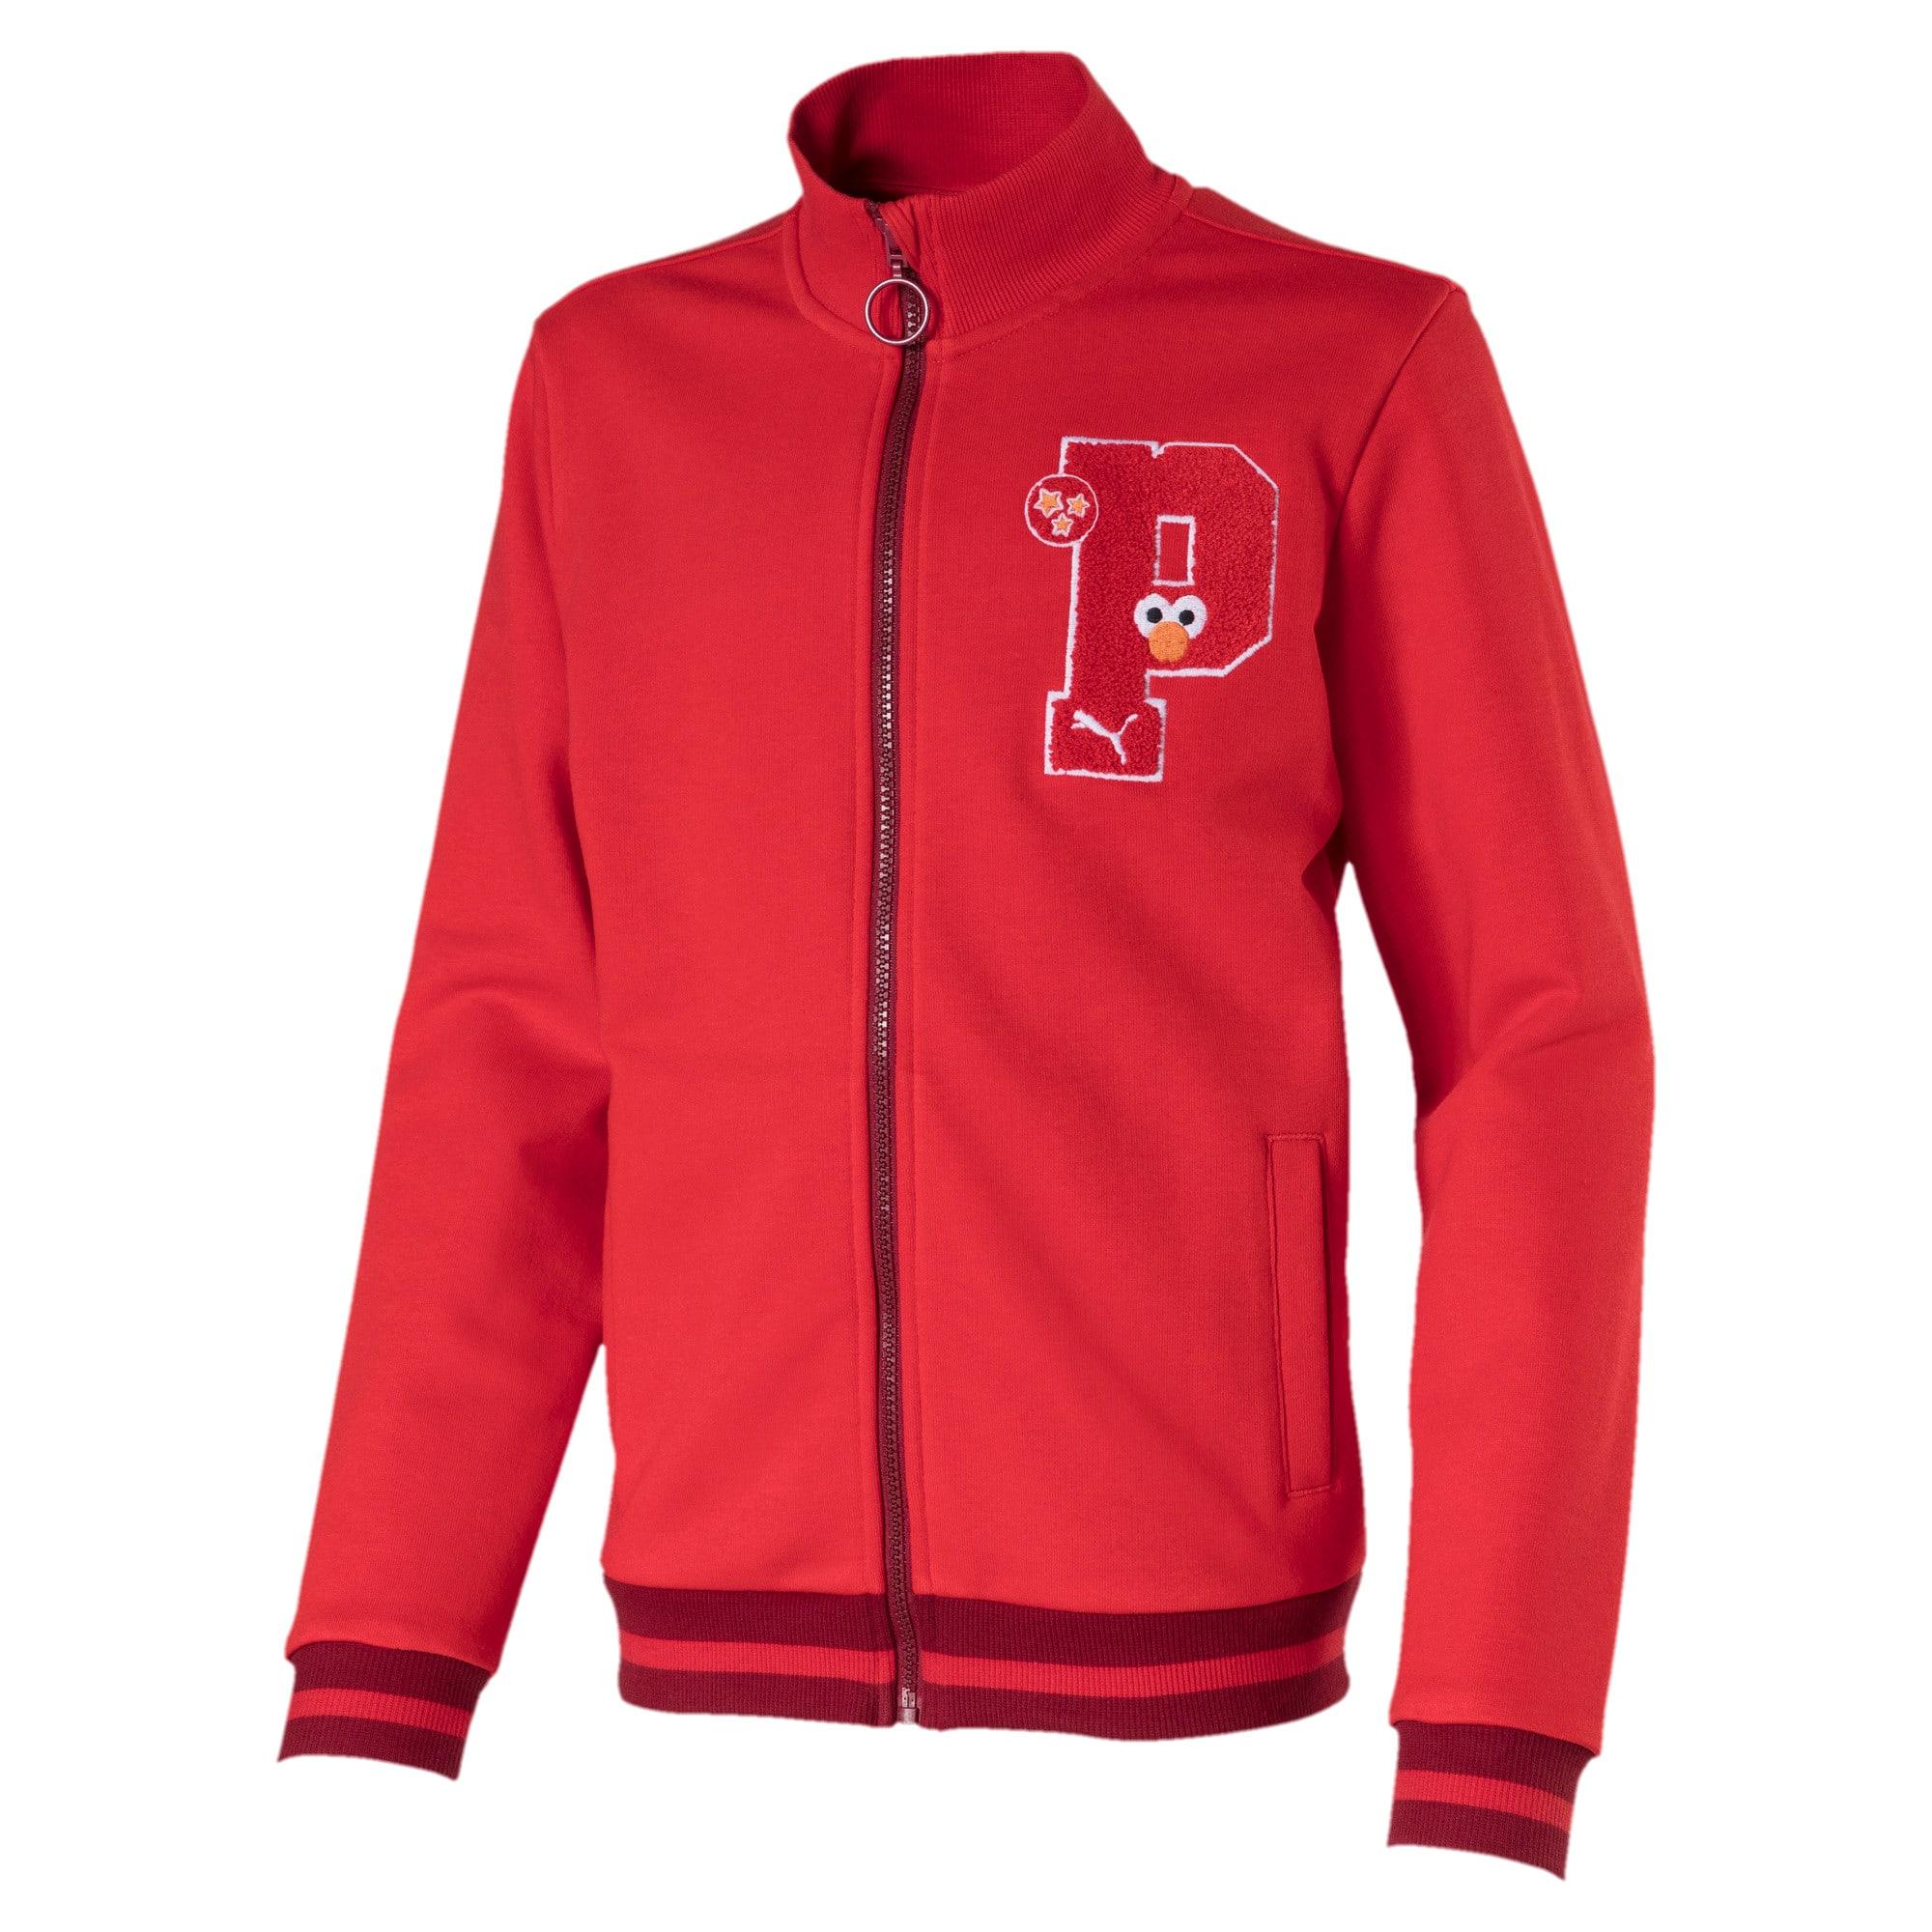 Thumbnail 1 of PUMA x SESAME STREET Kids' Sweat Jacket, High Risk Red, medium